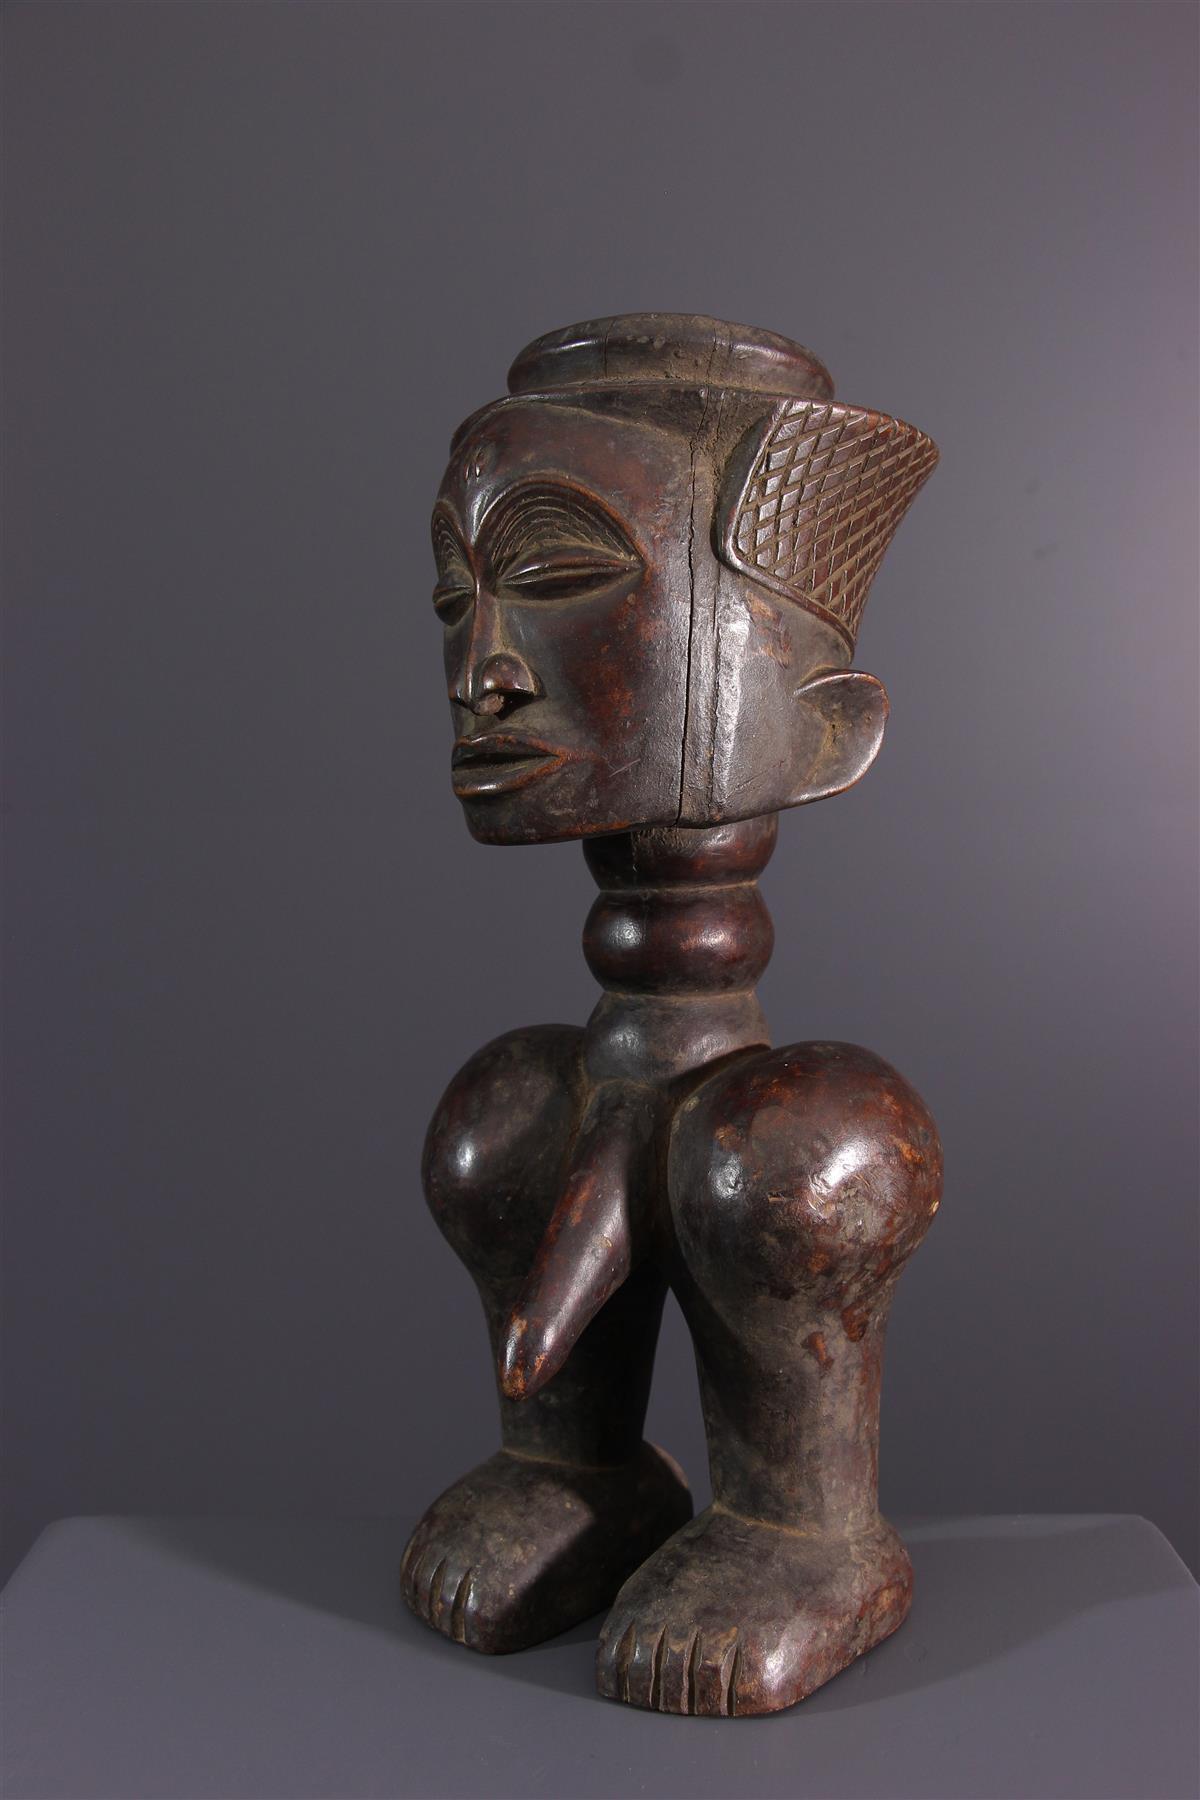 Cuba cup - African art